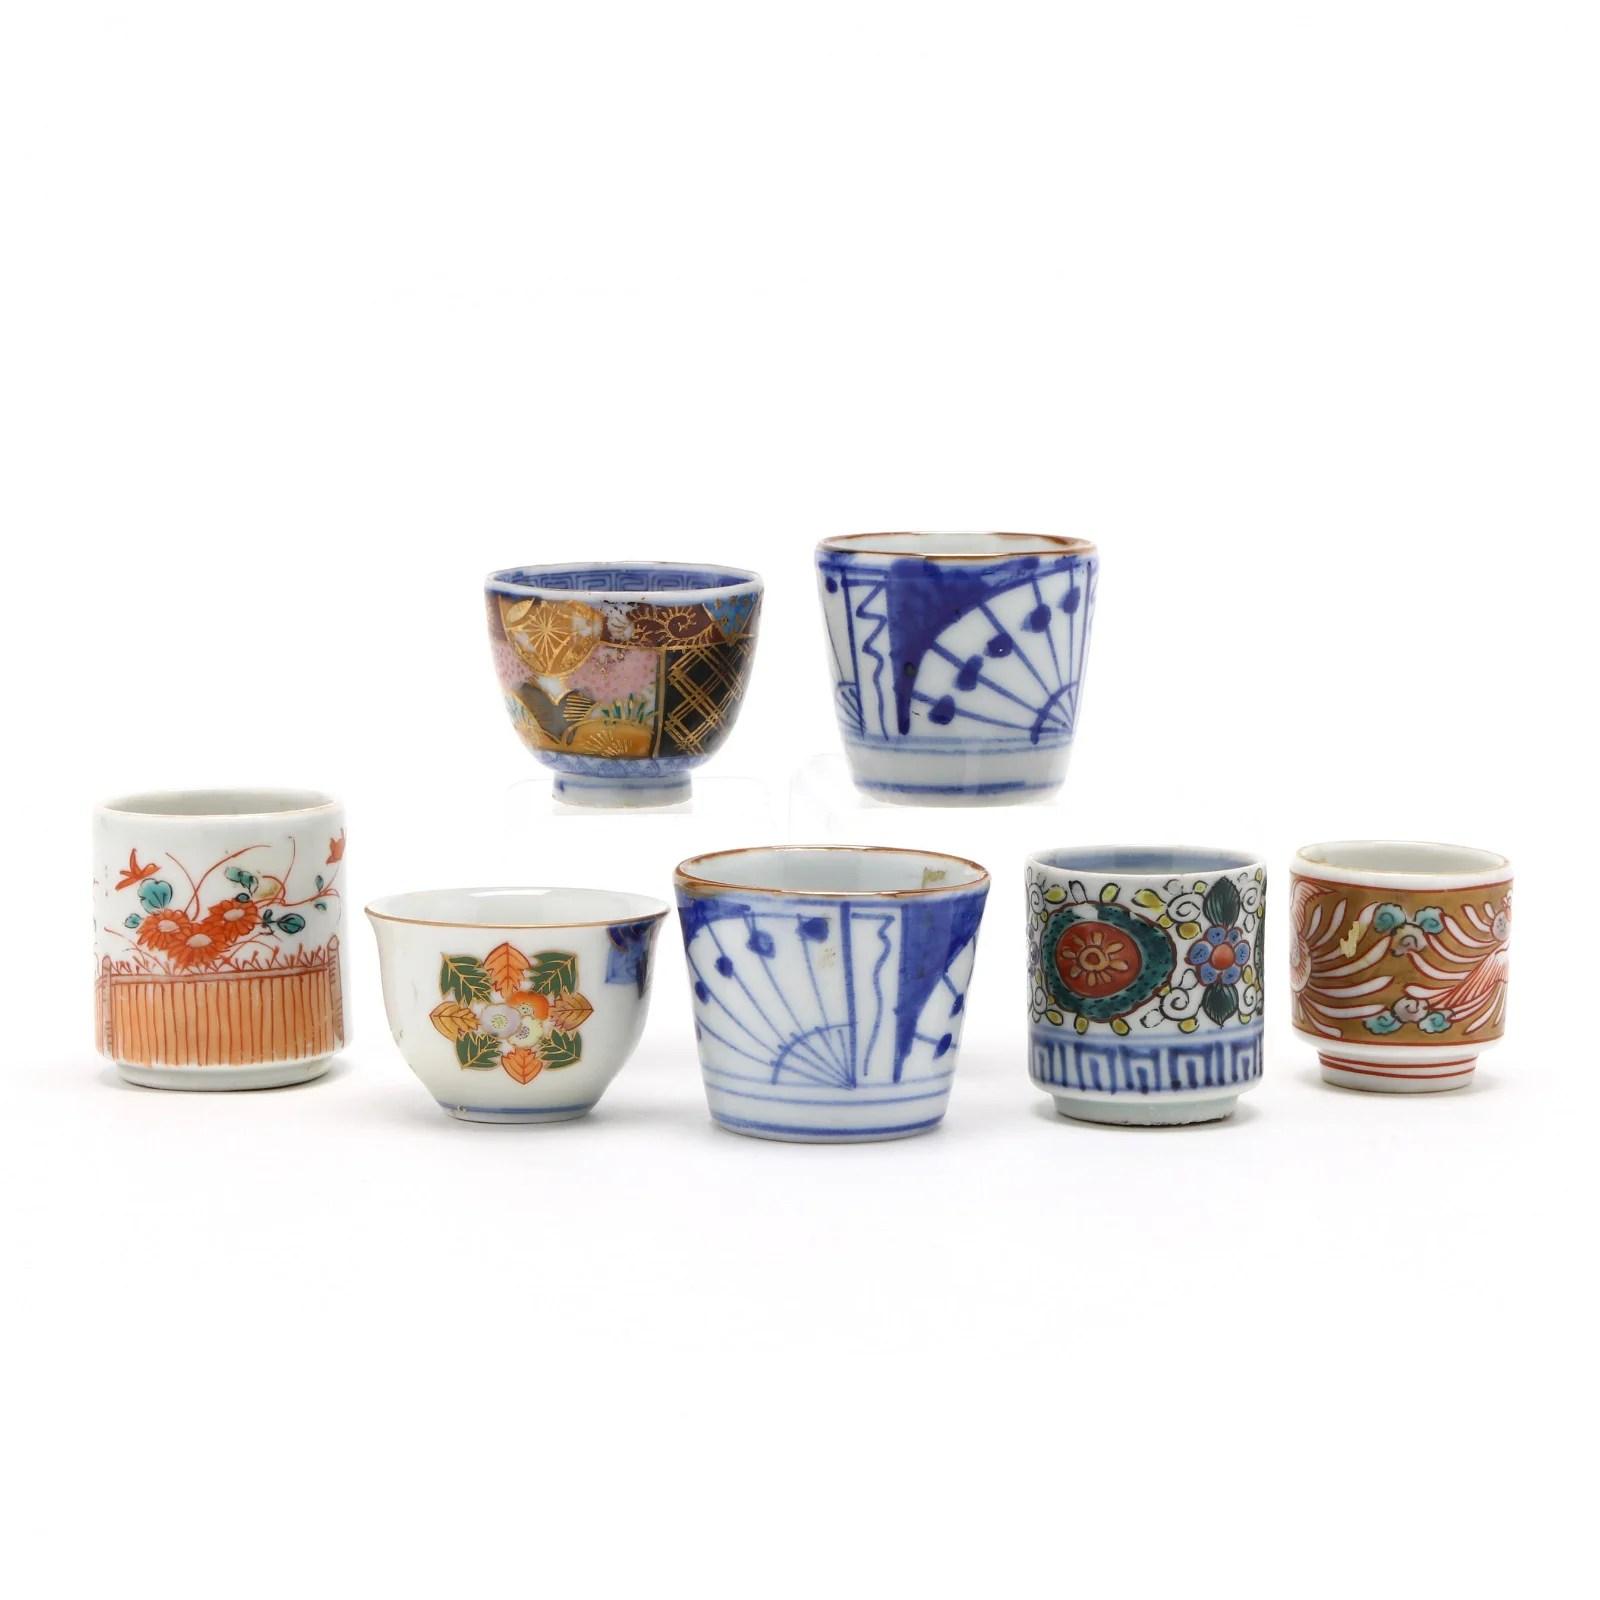 A Group of Seven Japanese Porcelain Sake Cups